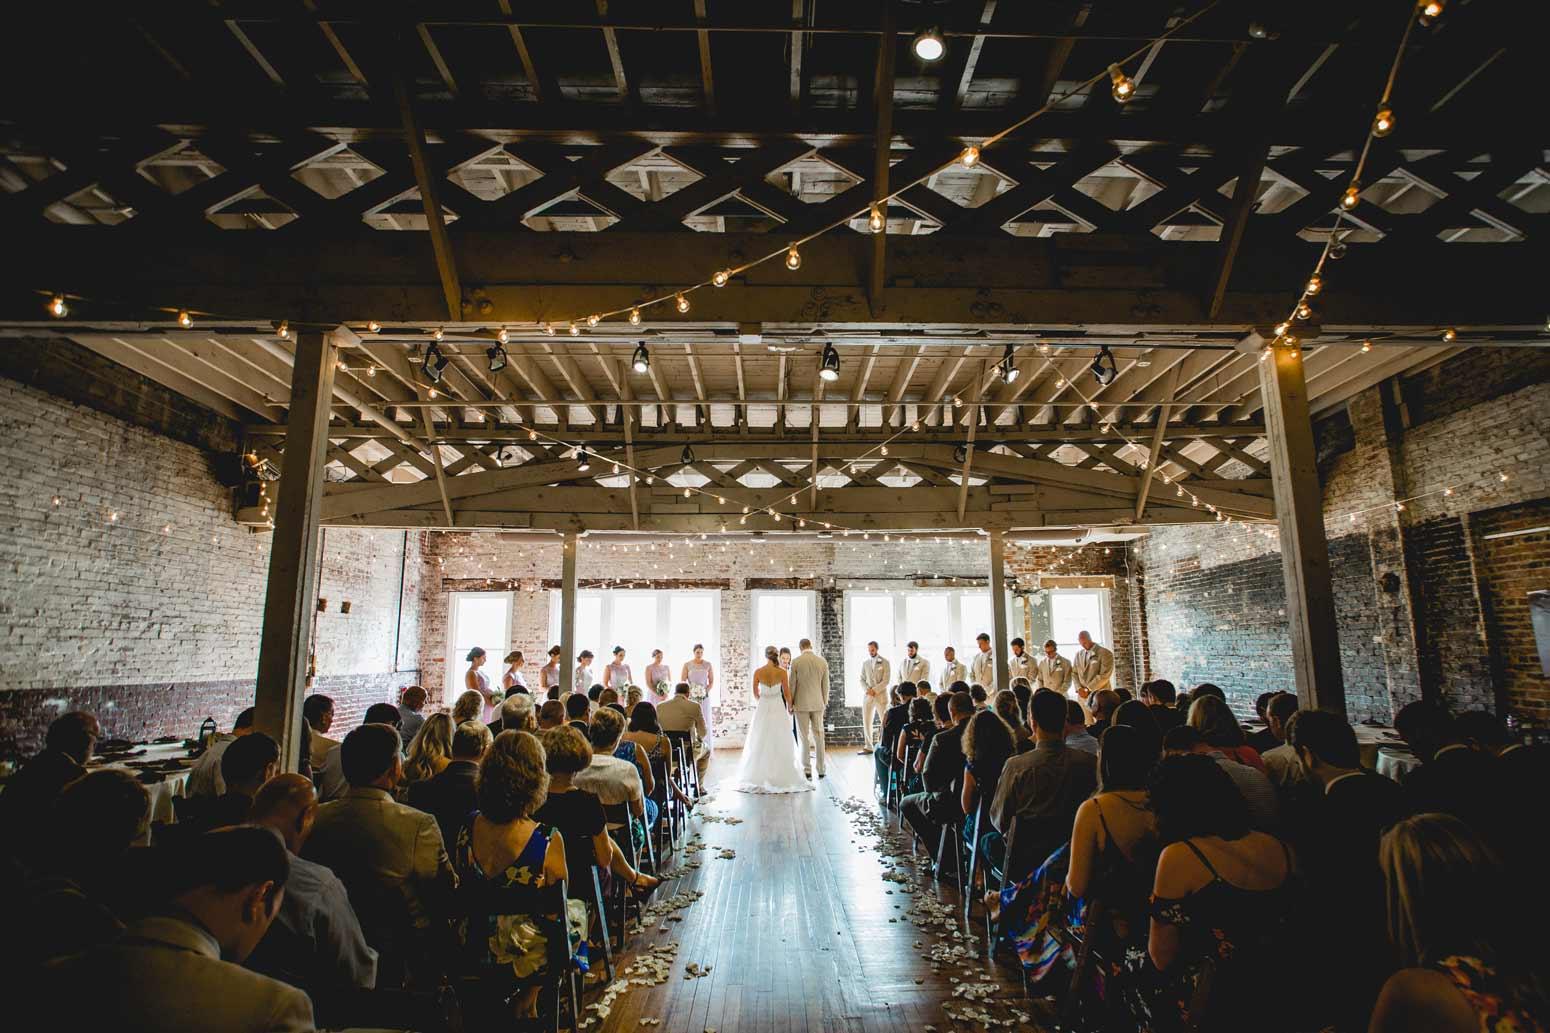 The-Stockroom-Raleigh-Wedding-Venue.jpg